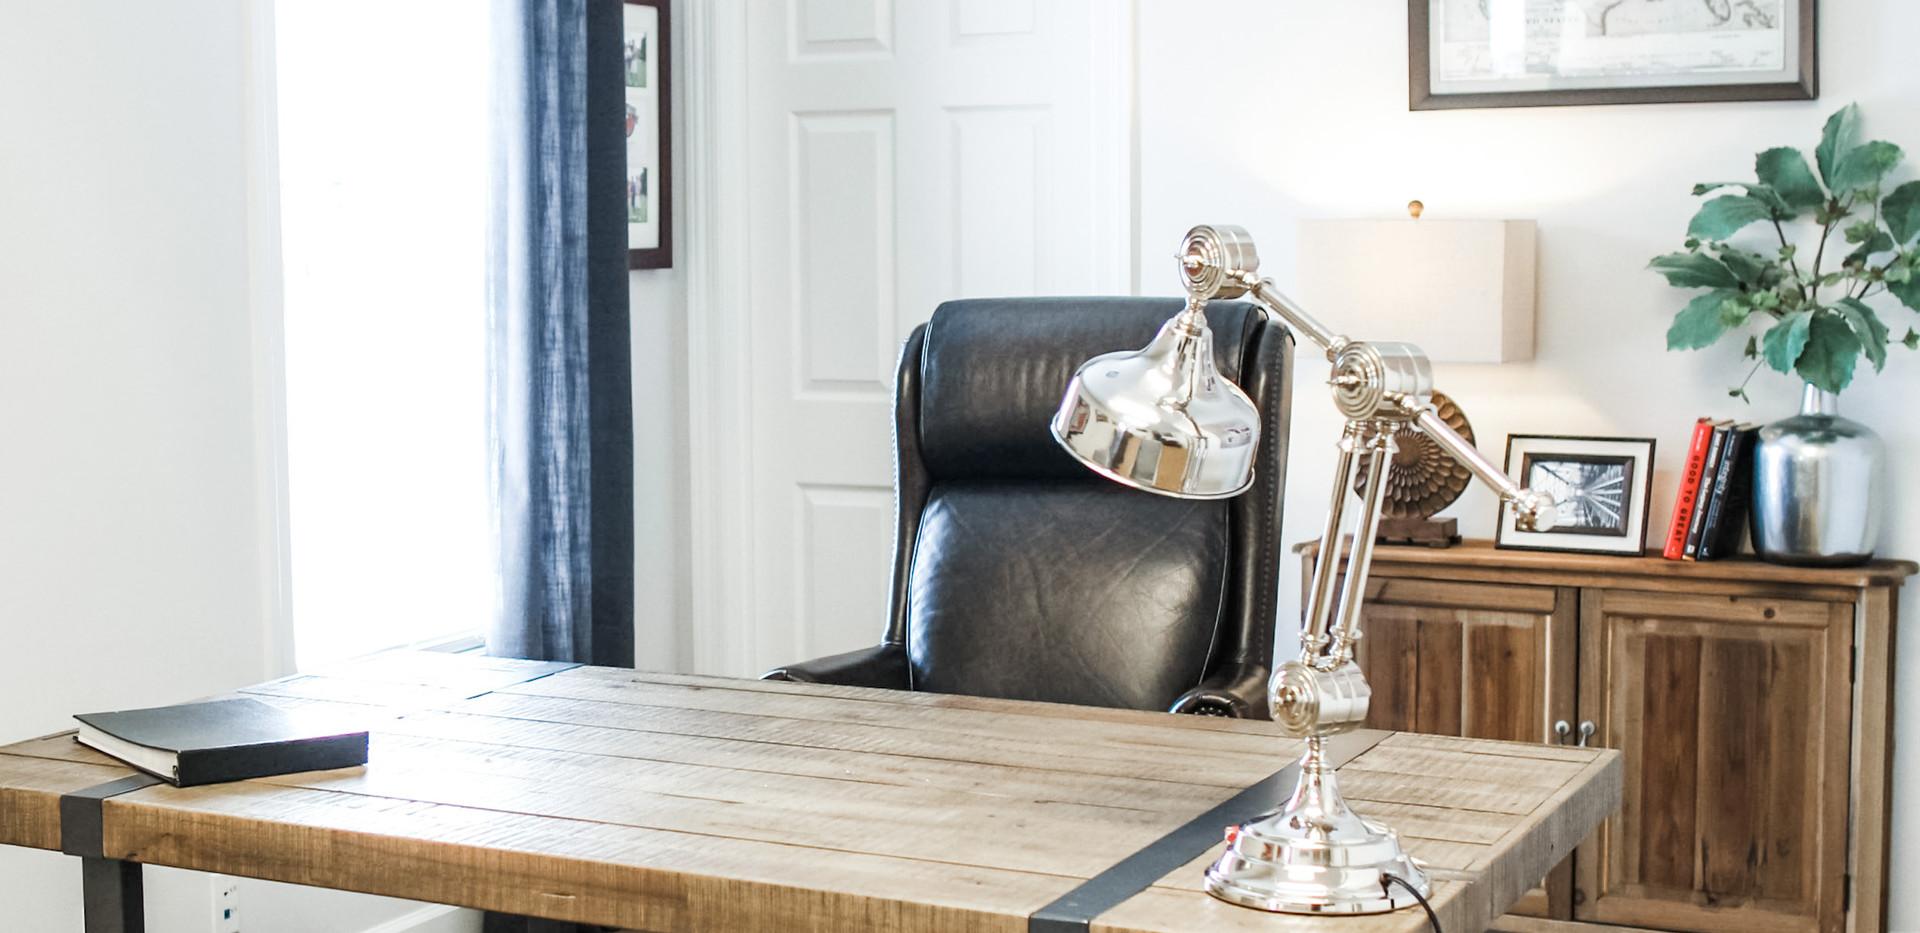 Office-decorating-ideas-2.JPG